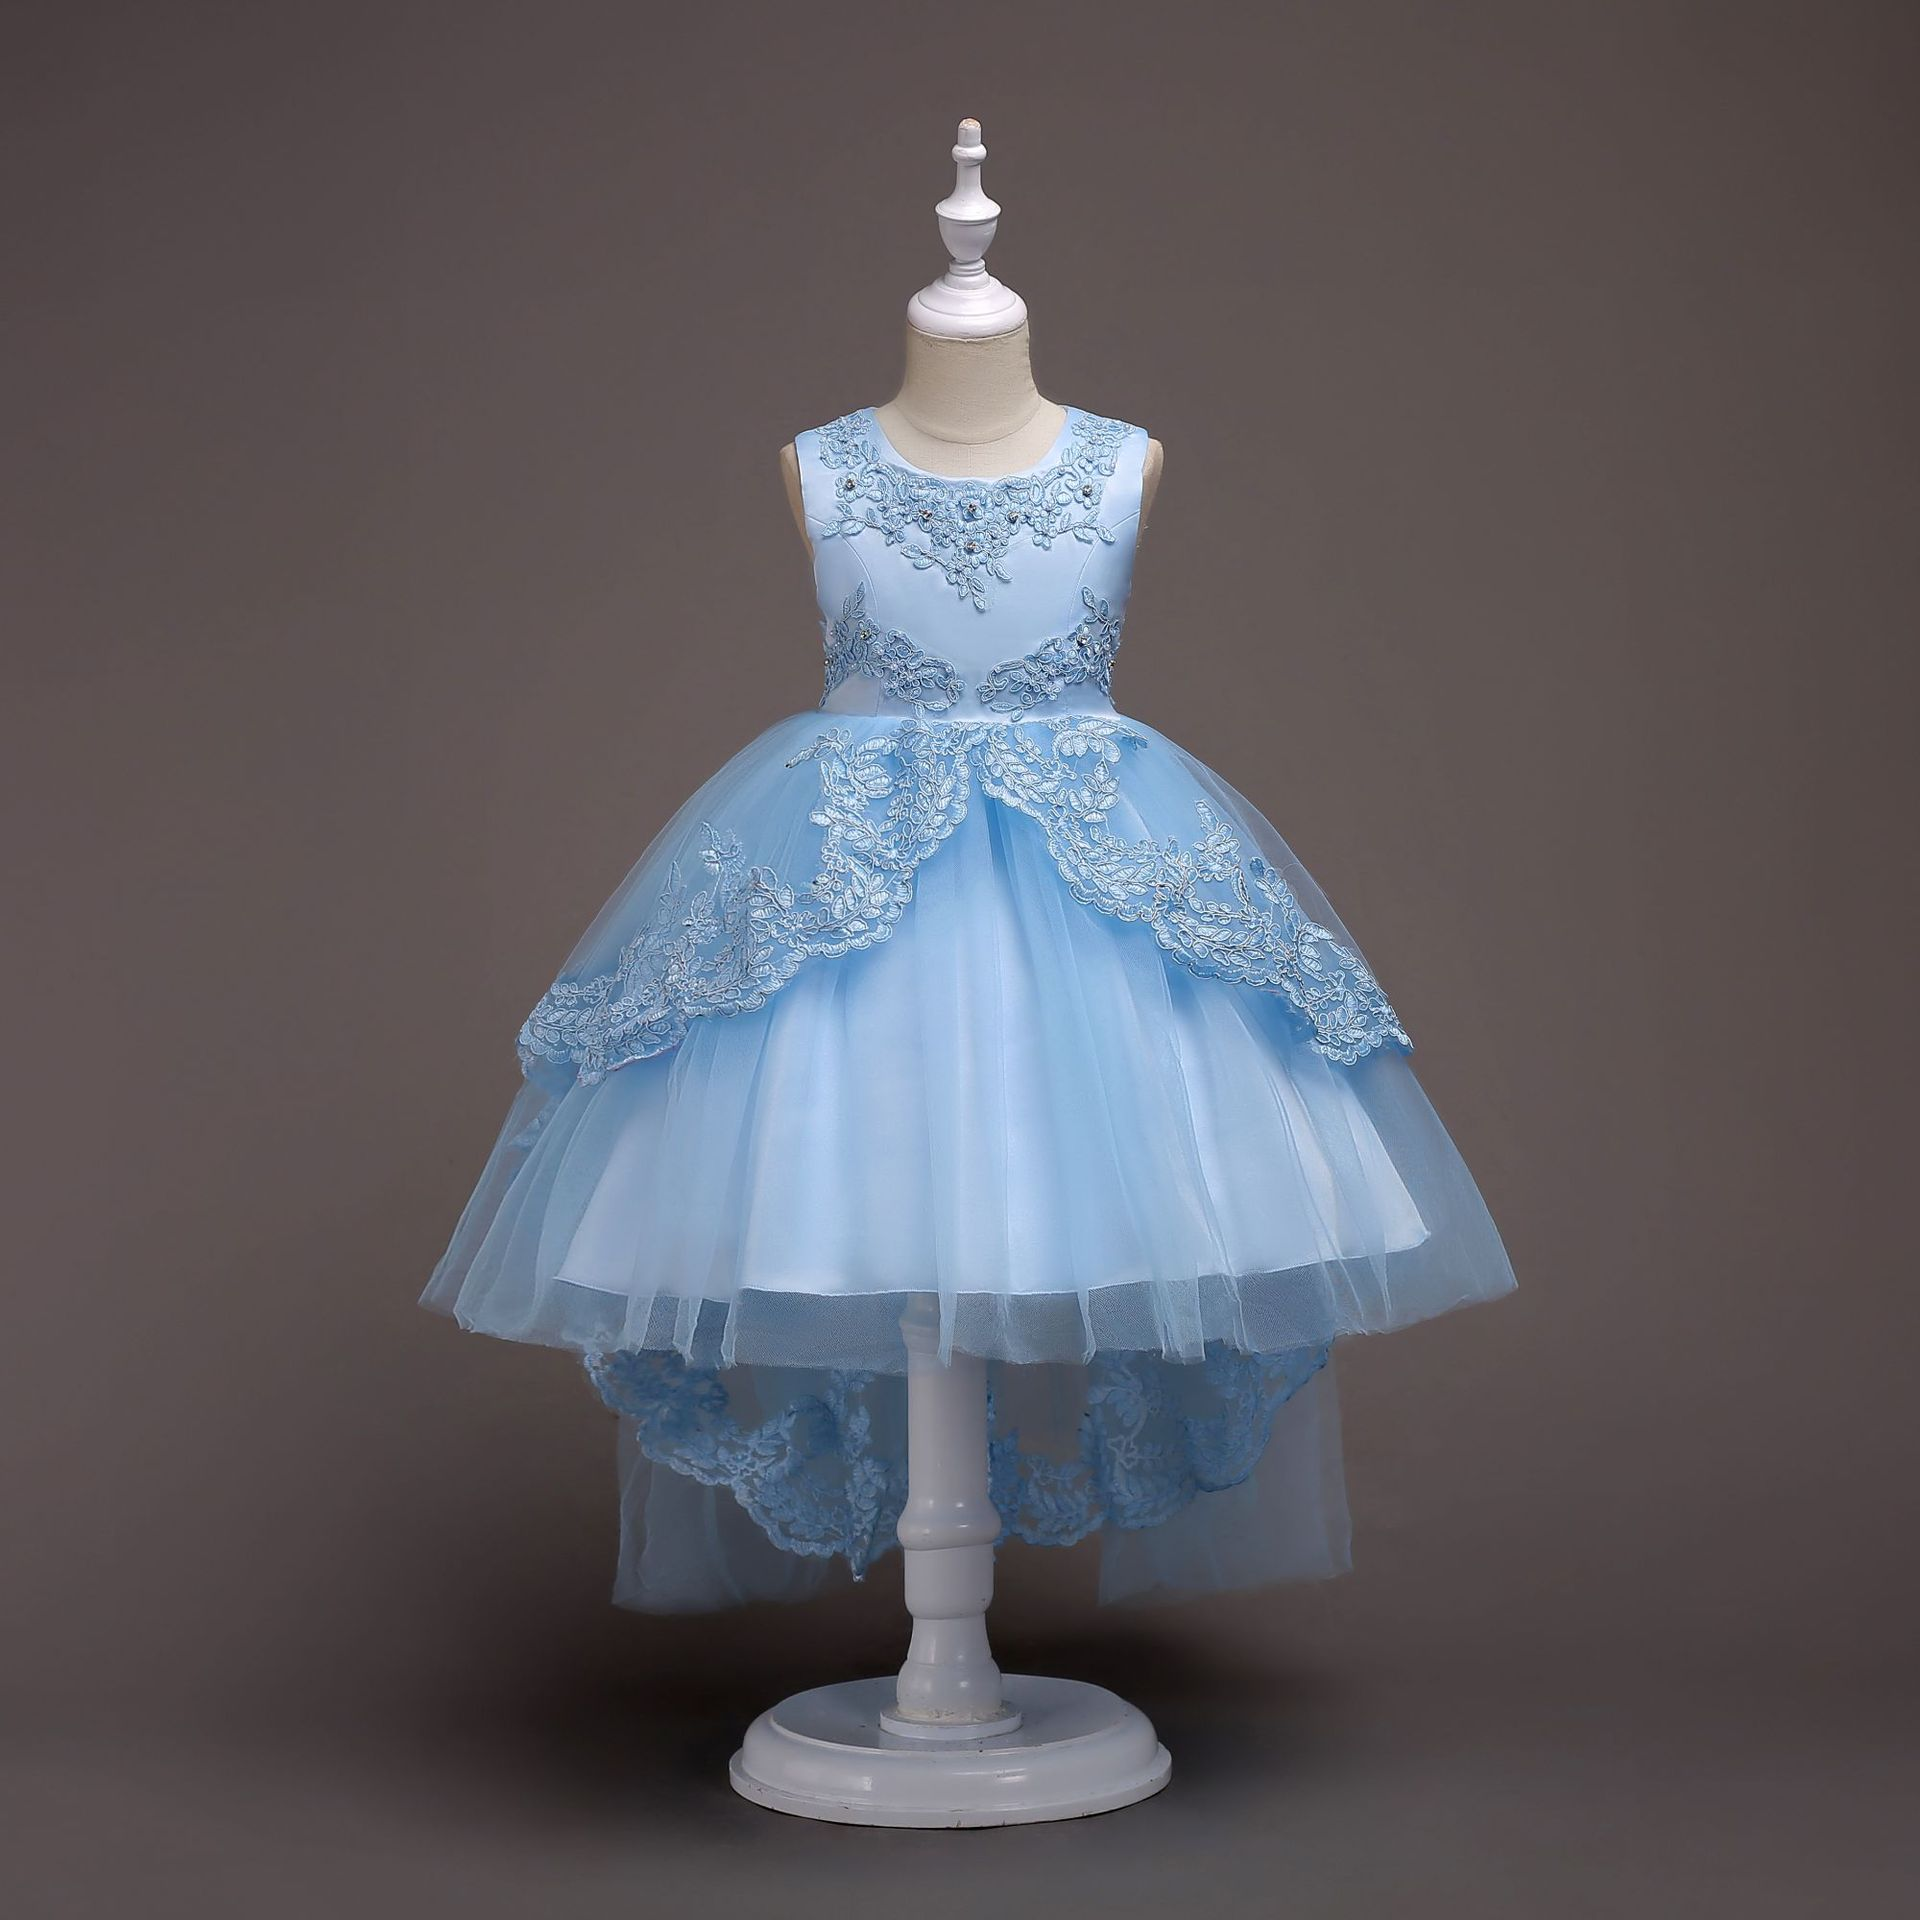 Children Formal Dress Princess Tutu Beaded Gauze Tutu Wedding Flower CHILDREN'S Dress